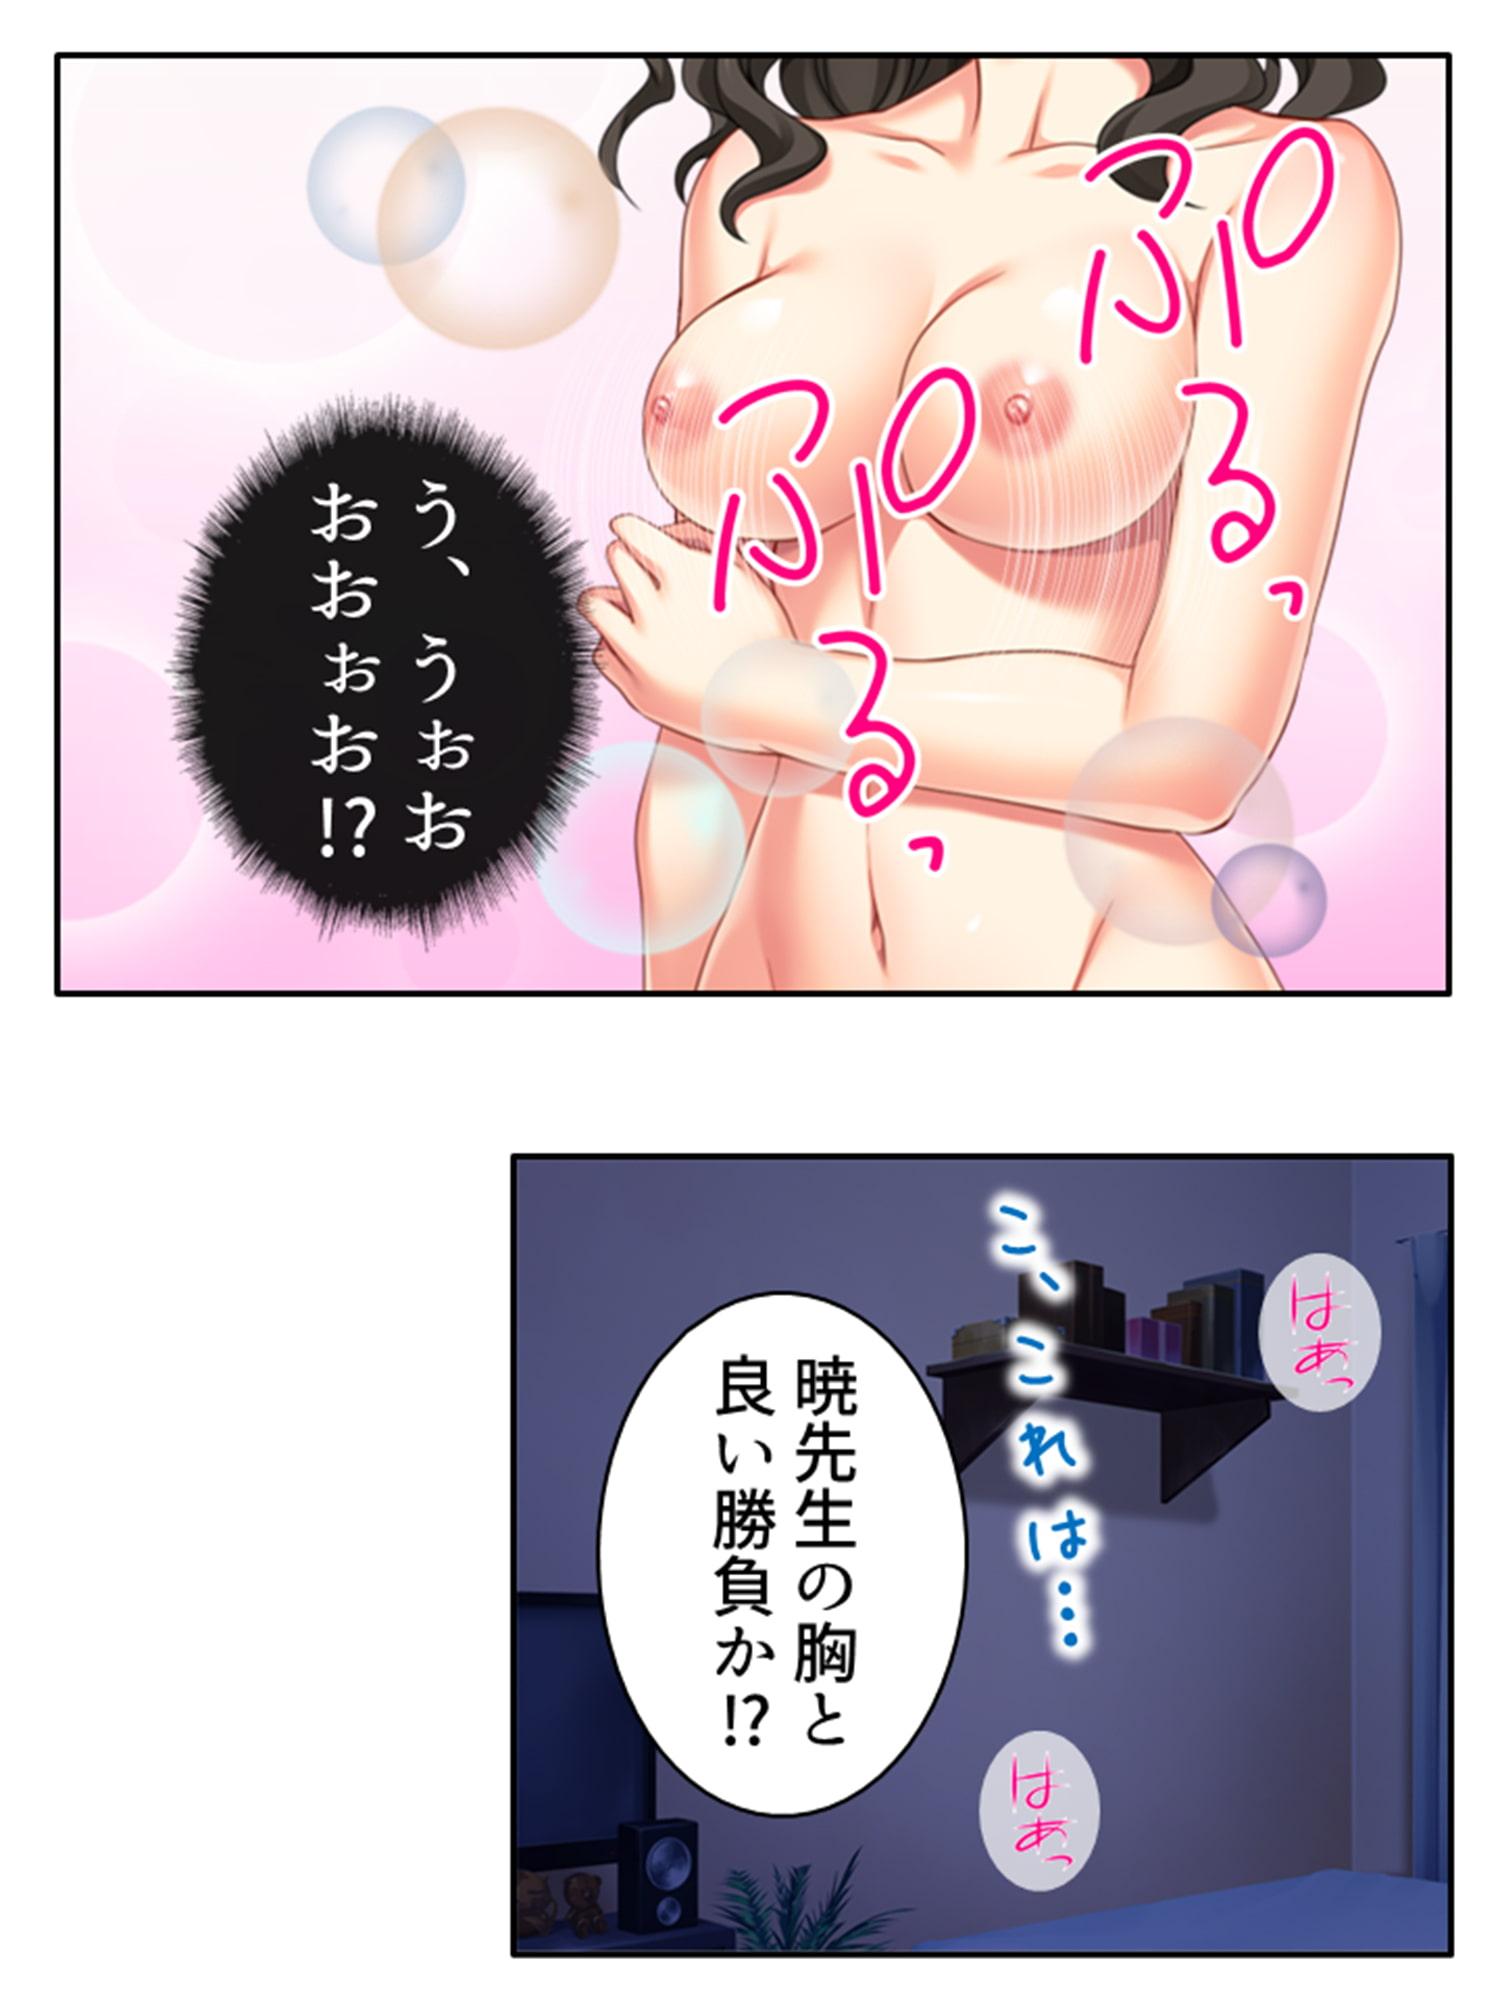 RJ325800 憧れの漫画家はド変態読者には秘密の制作現場 下巻 [20210504]